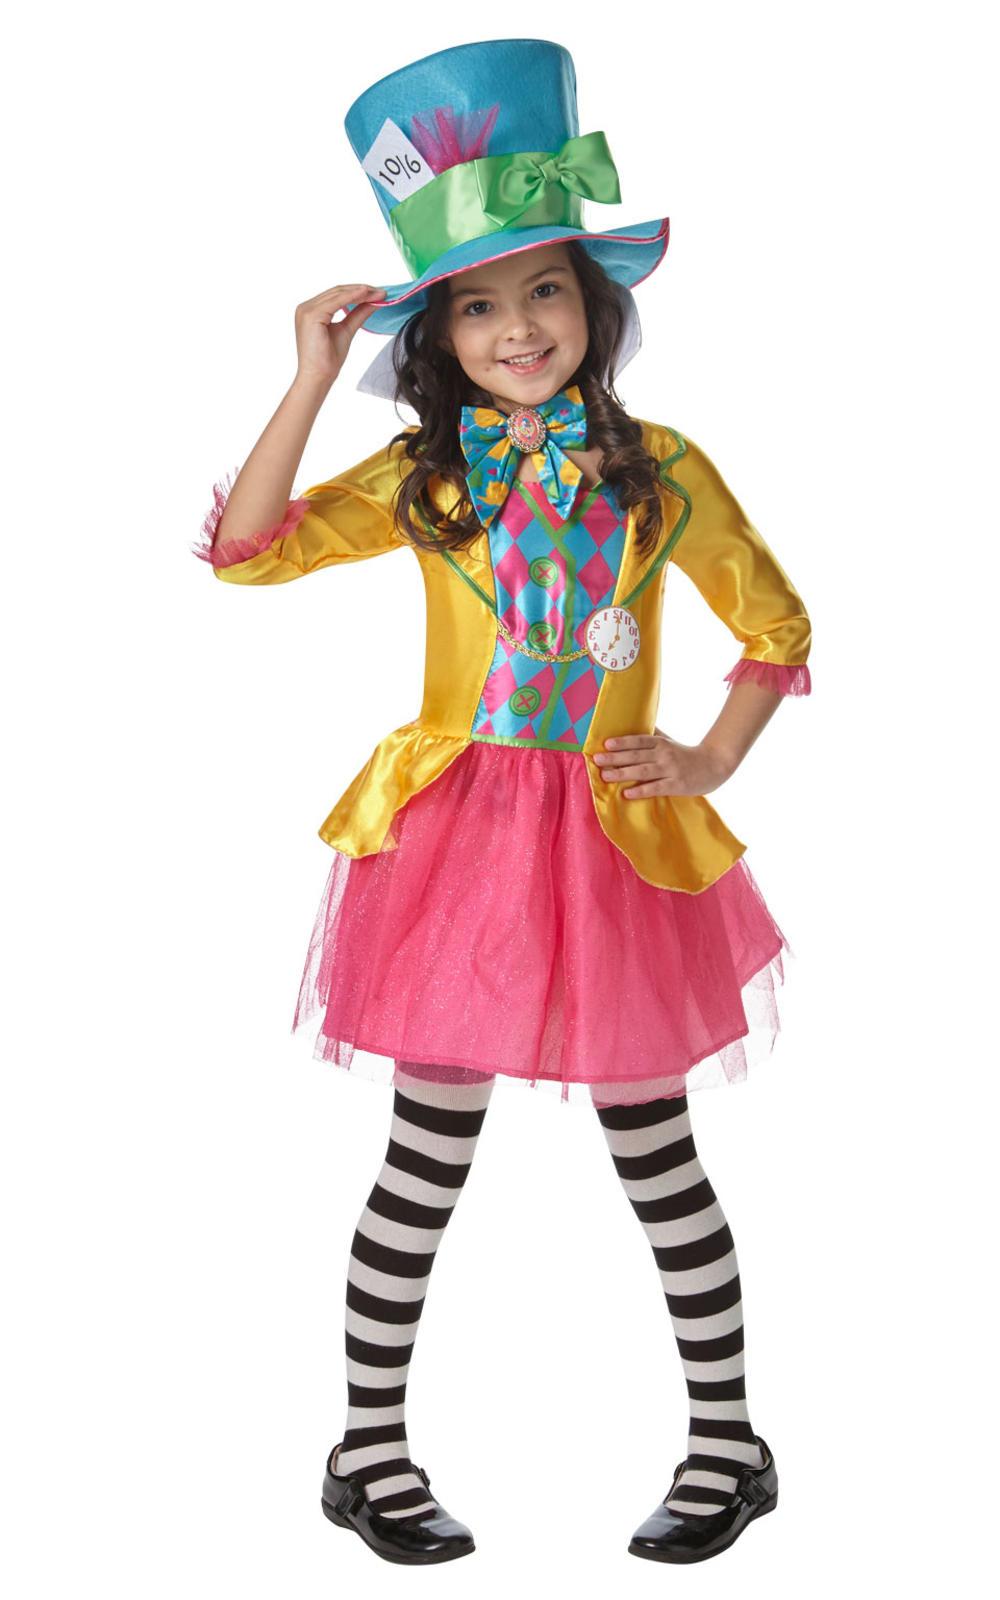 Mad Hatter Girls Fancy Dress Book Day Alice in Wonderland Childrens Kids Costume